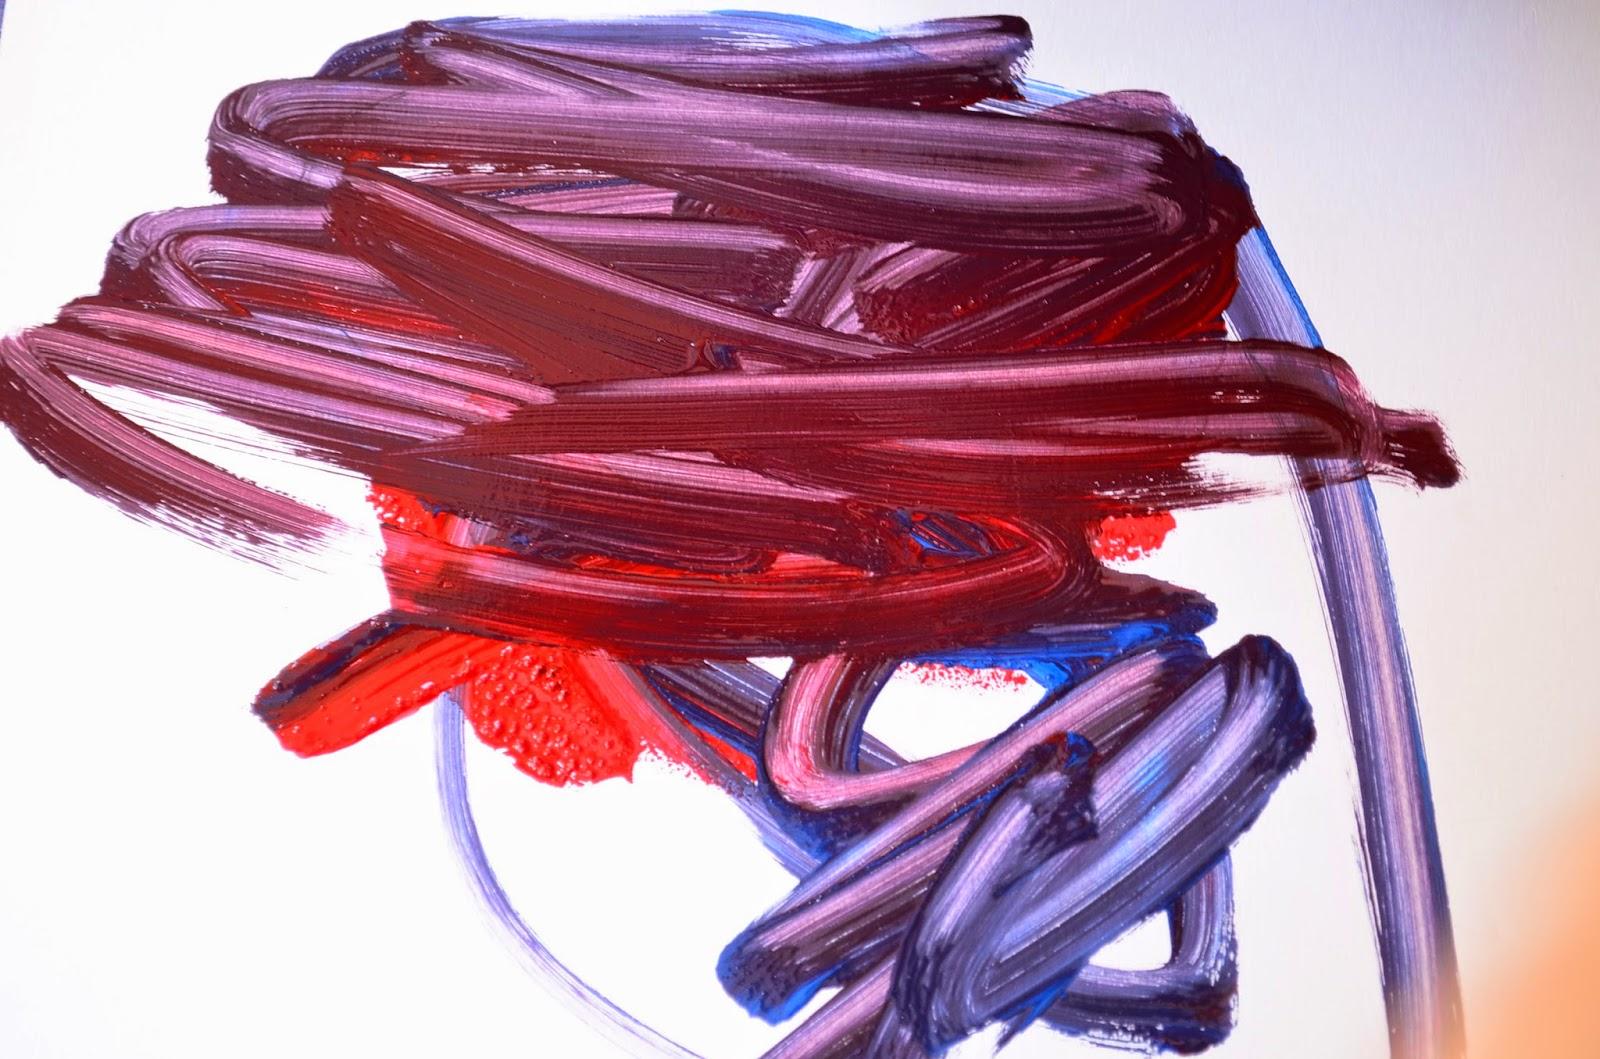 Exploring Sgraffito Art with Kids (Art Studio Diaries)